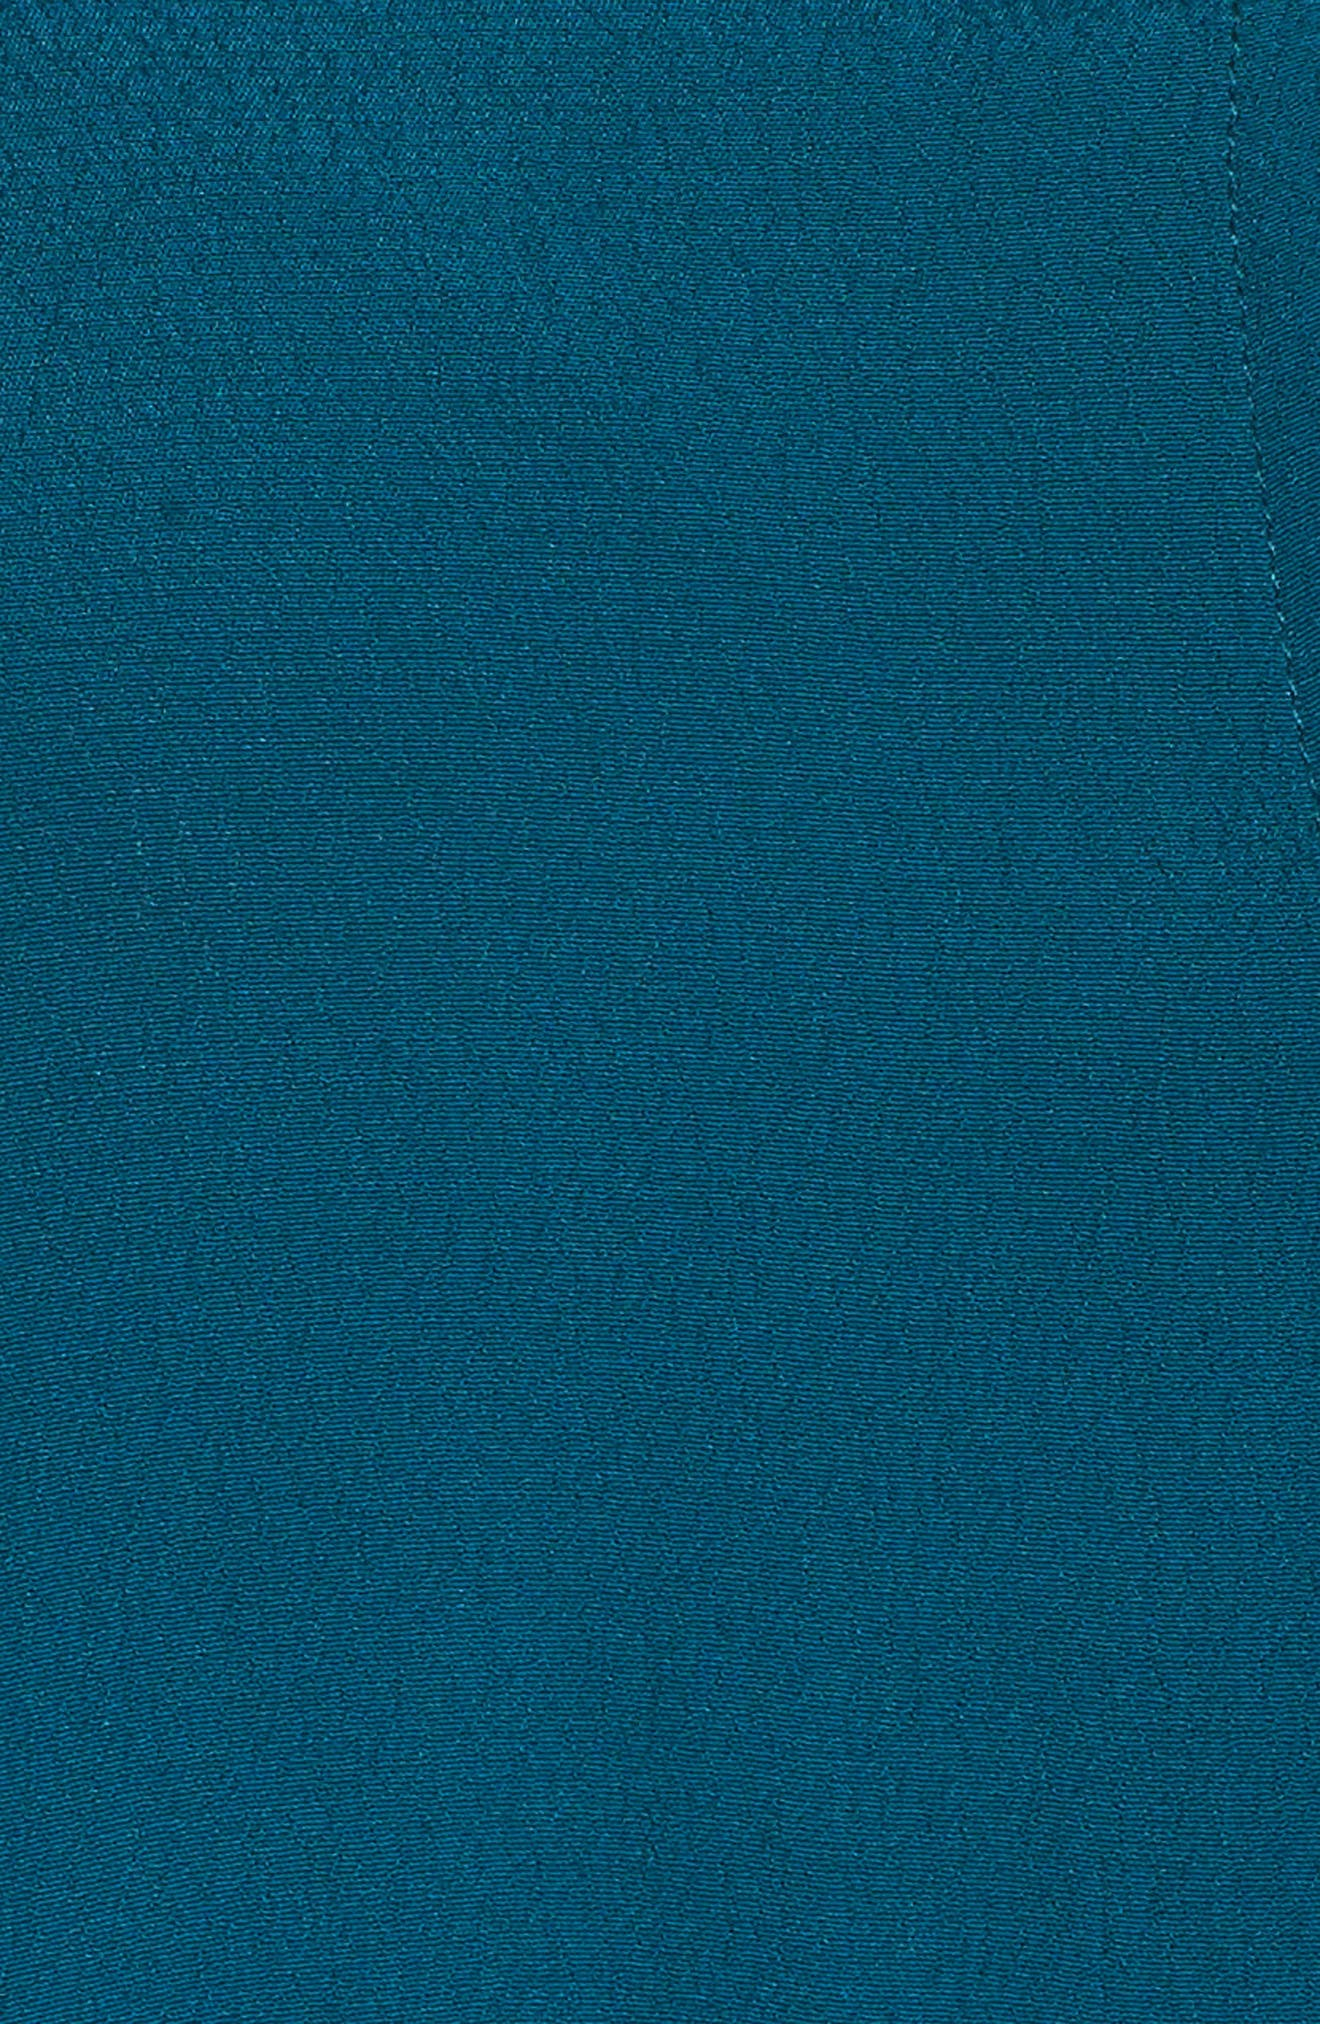 Button Front Trapeze Dress,                             Alternate thumbnail 5, color,                             Teal